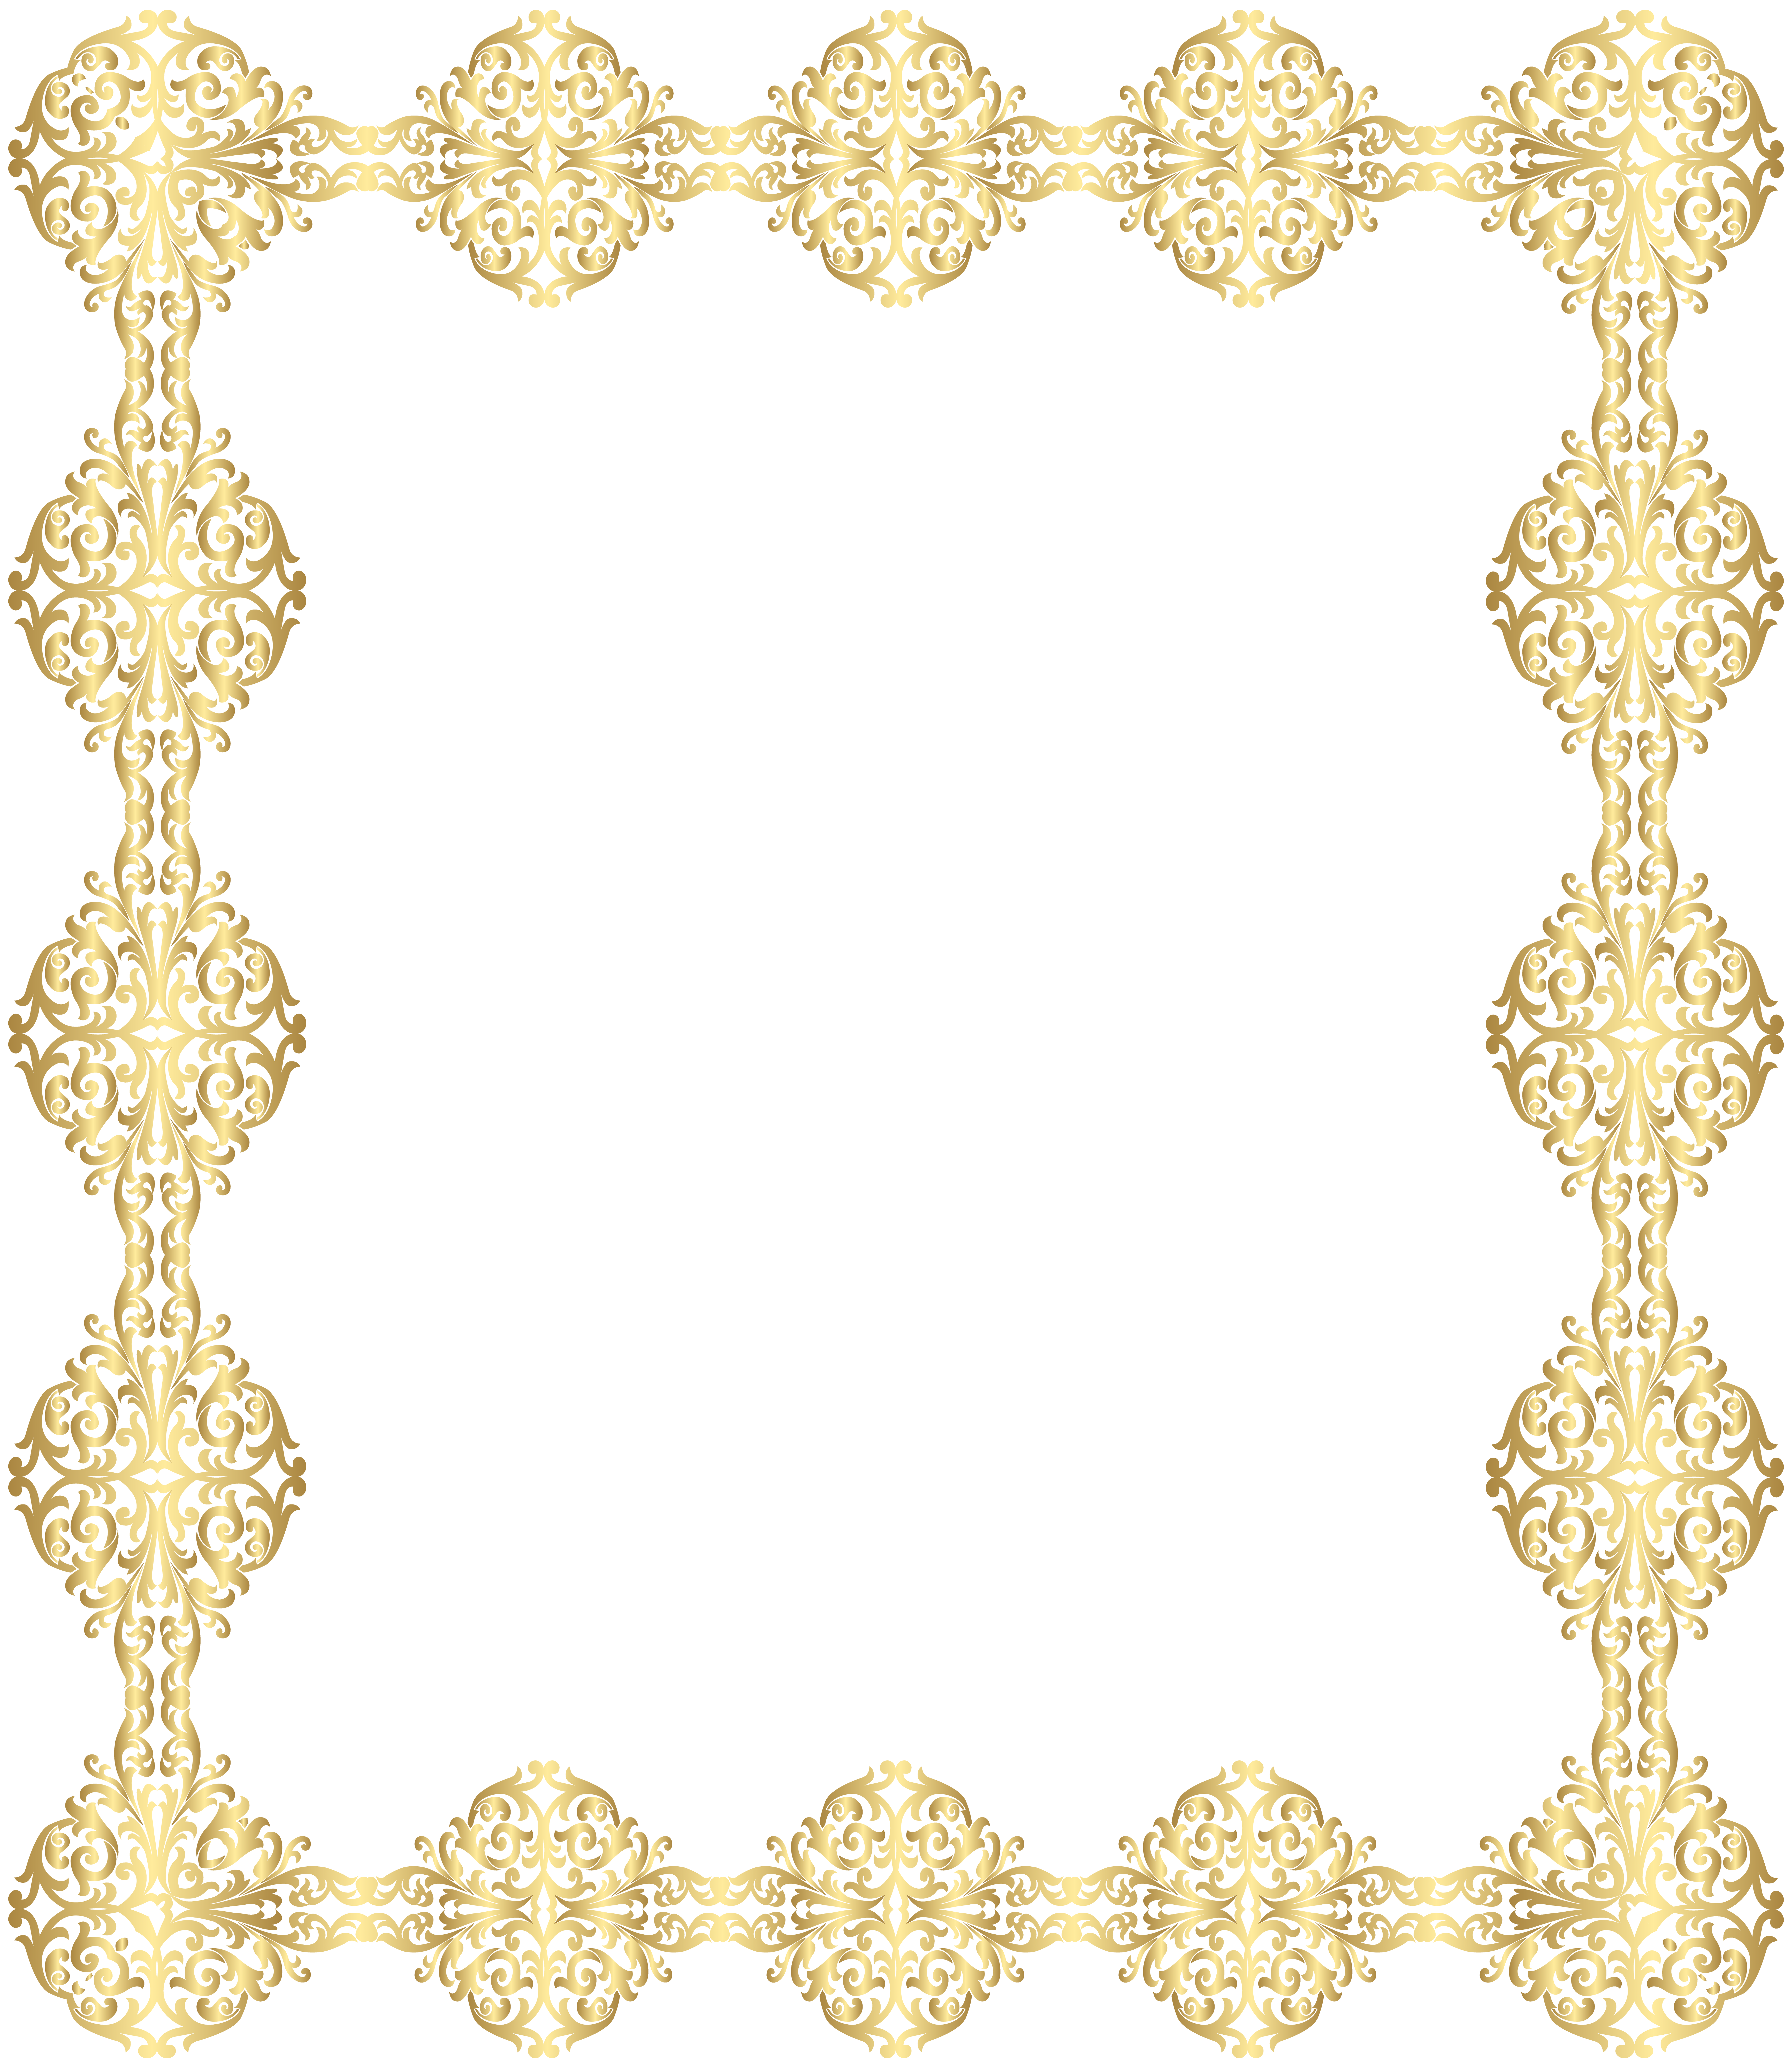 Golden border transparent png. Column clipart laurel